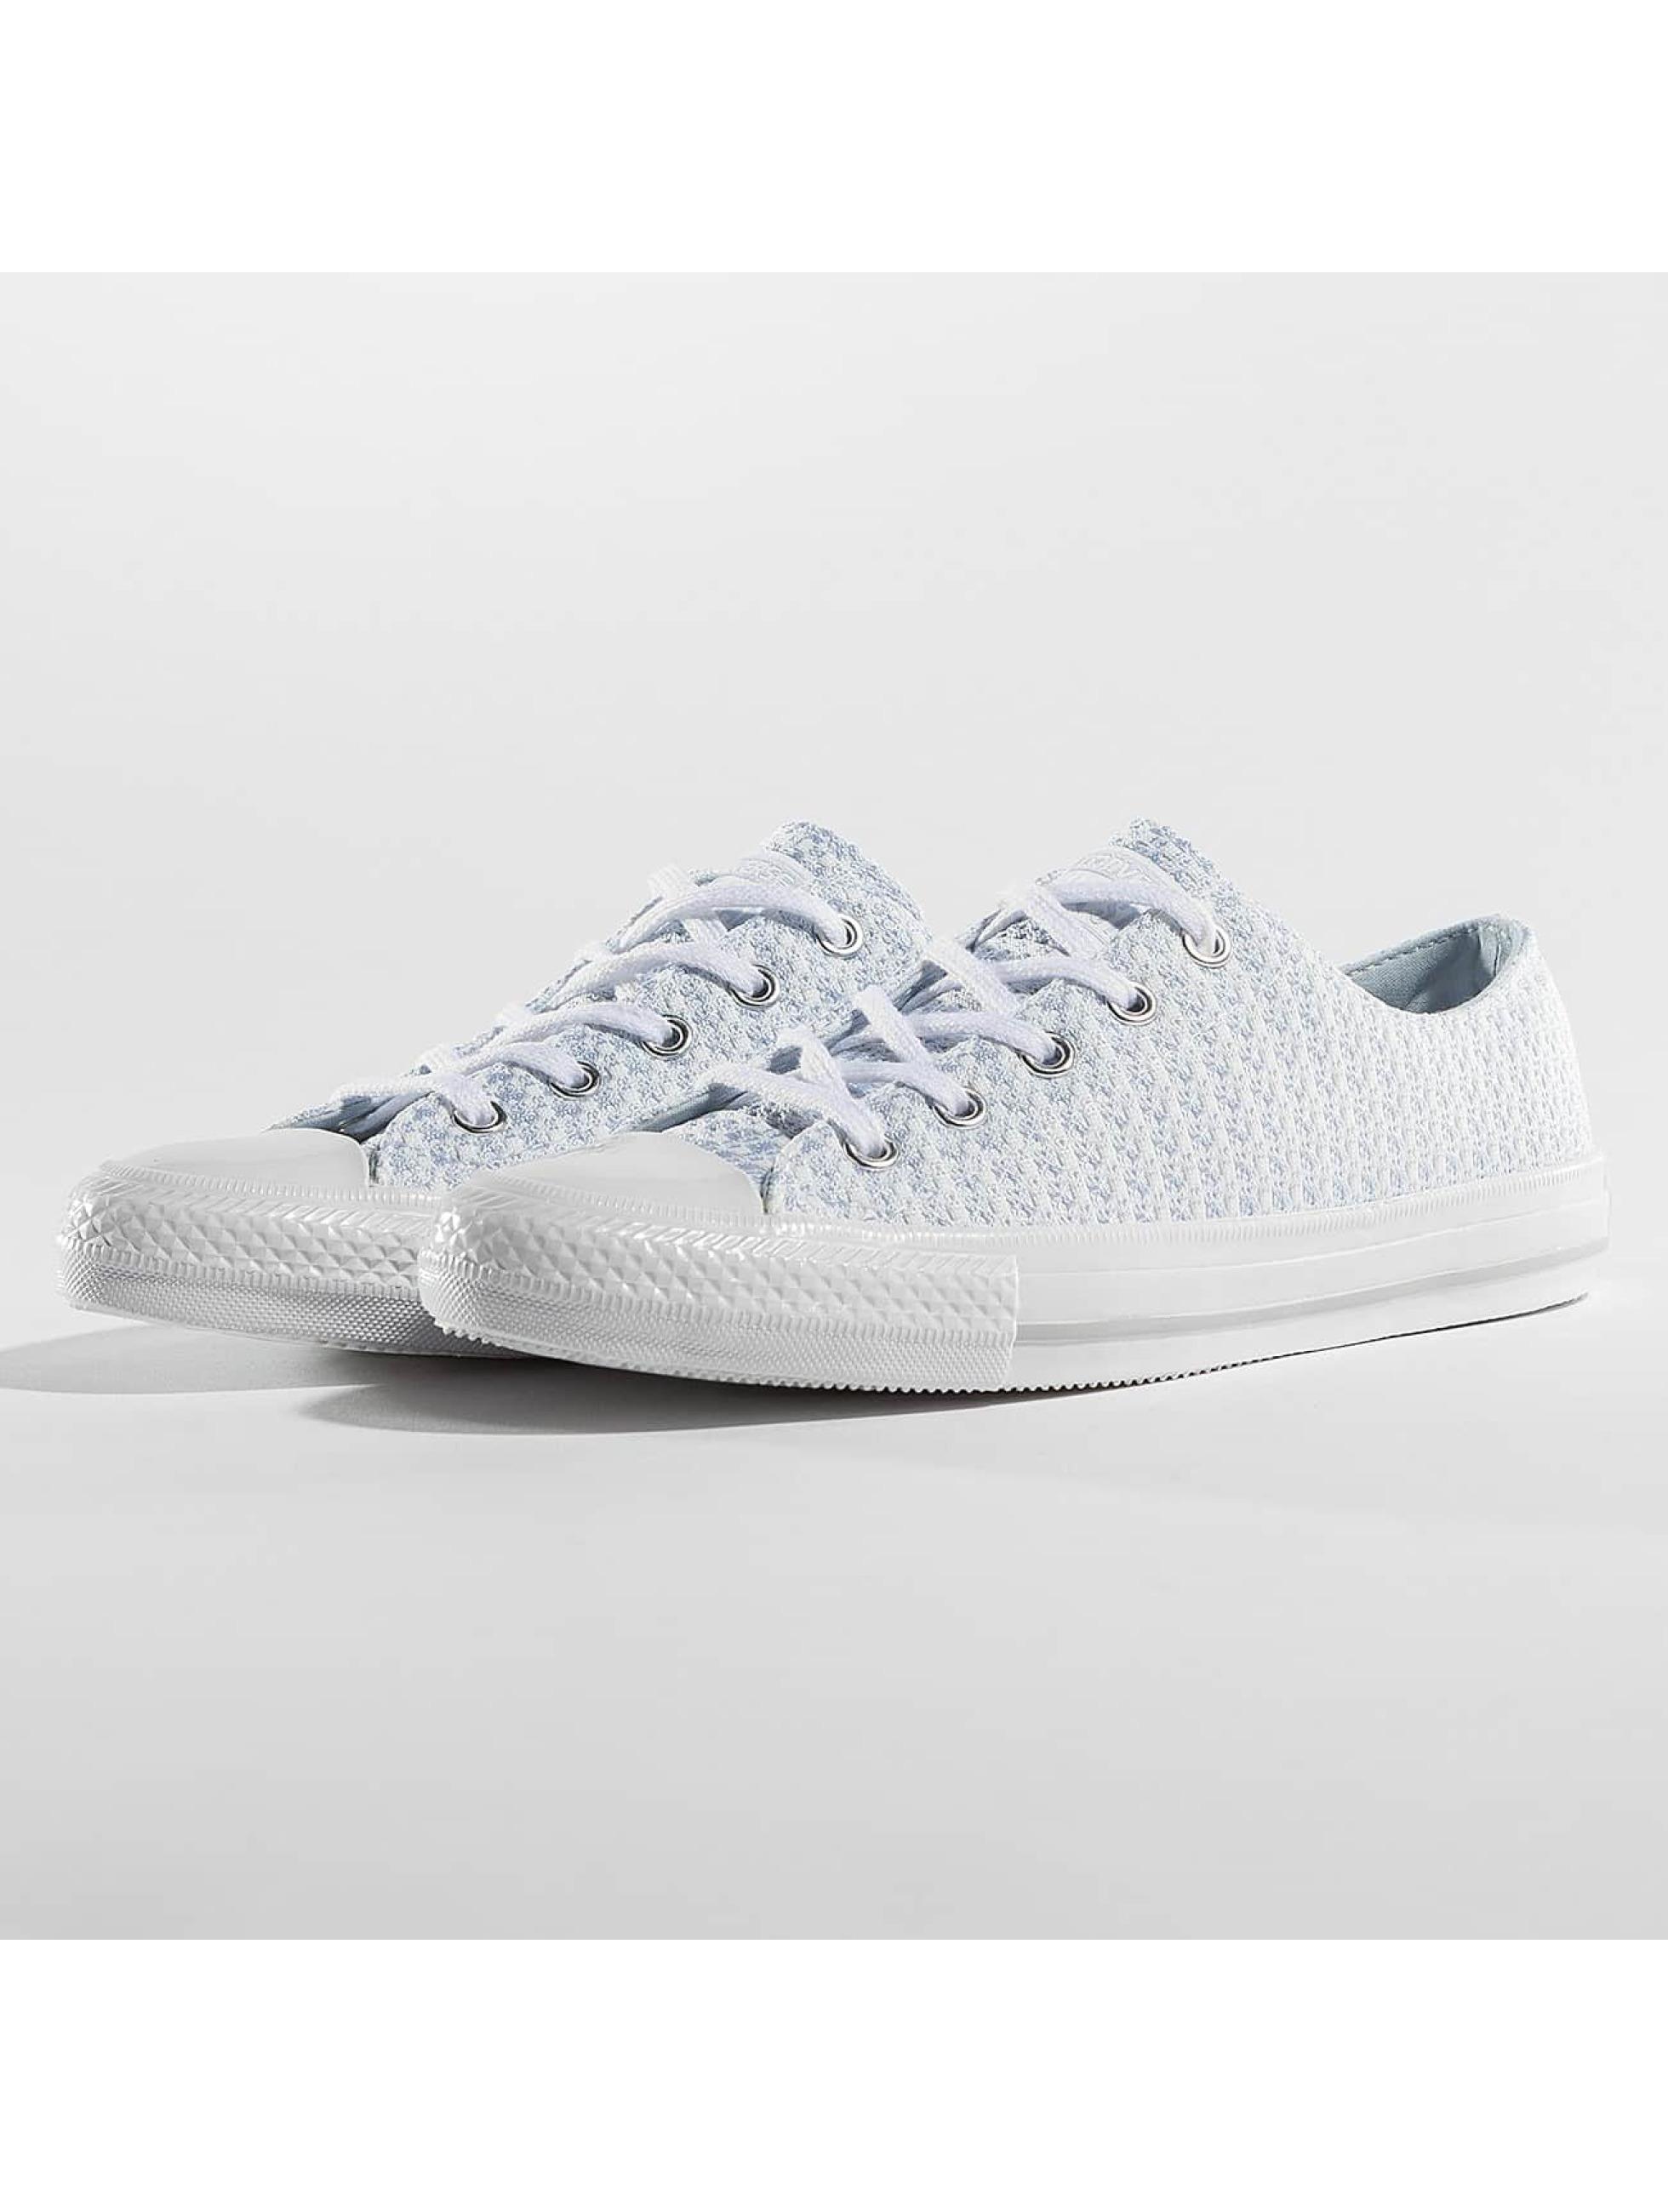 Converse Frauen Sneaker CTAS Gemma Festival Knit Ox in blau